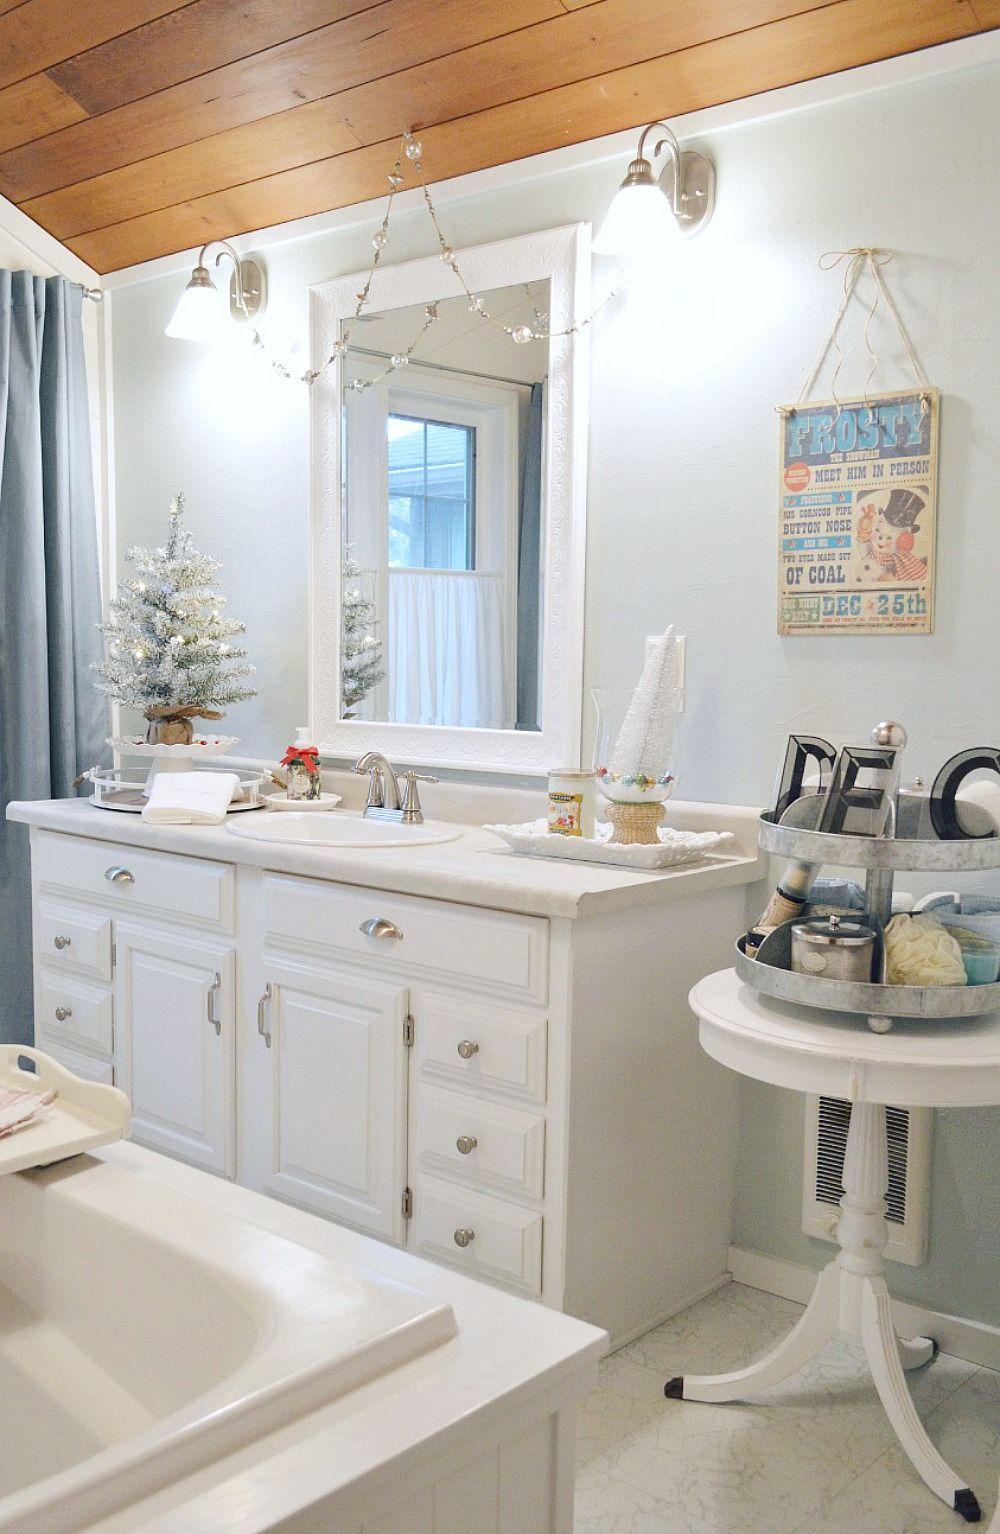 Coastal Cottage Christmas Bath   Christmas Ideas   Pinterest ...